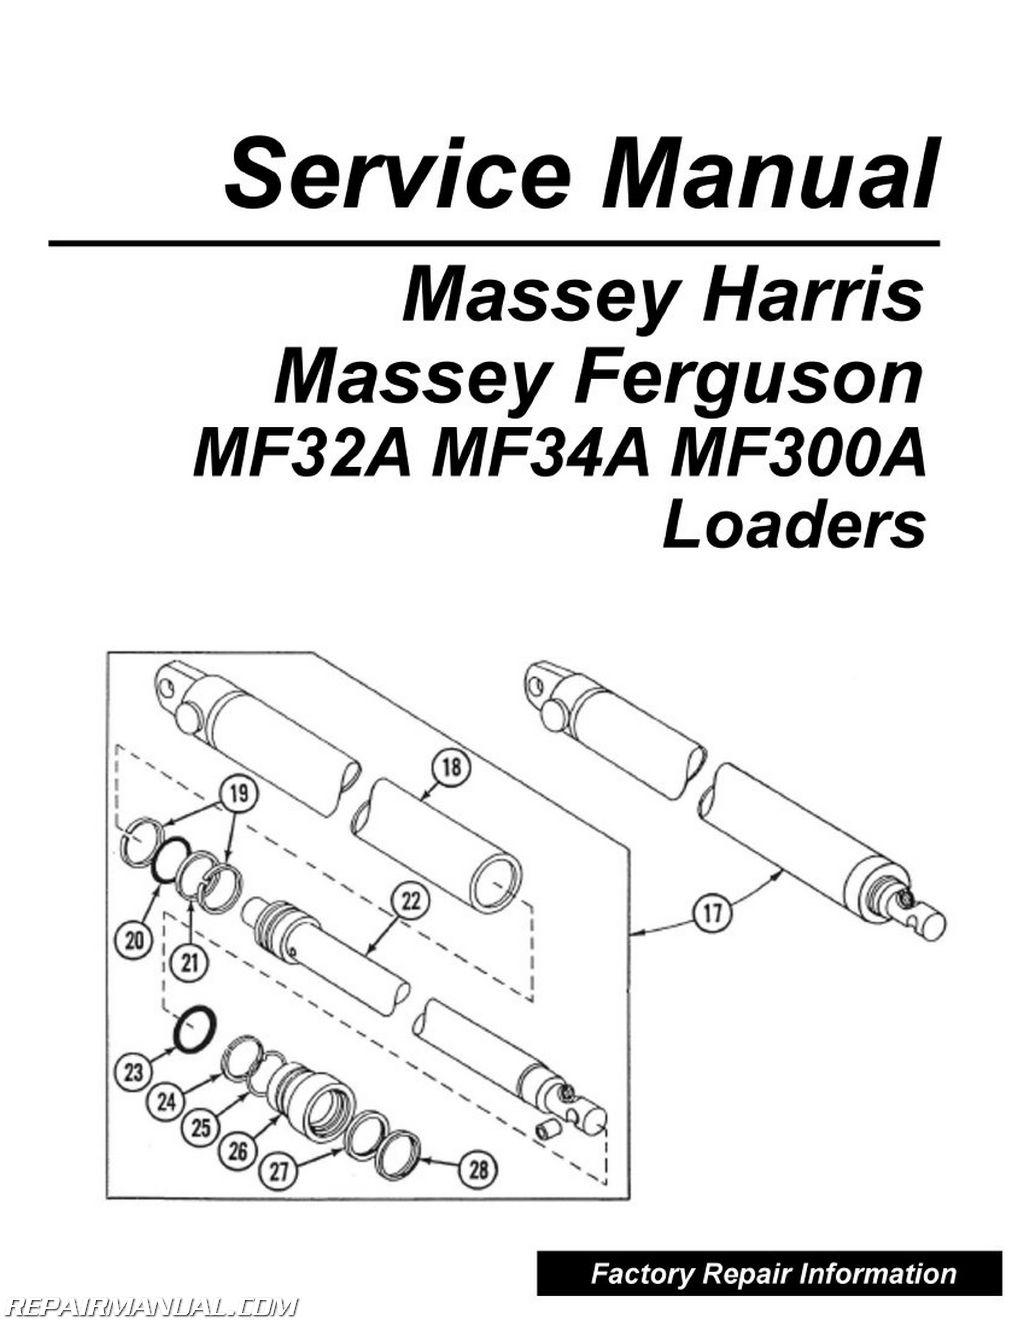 Massey-Ferguson Model MF32A MF34A MF300A Loader Service Manual